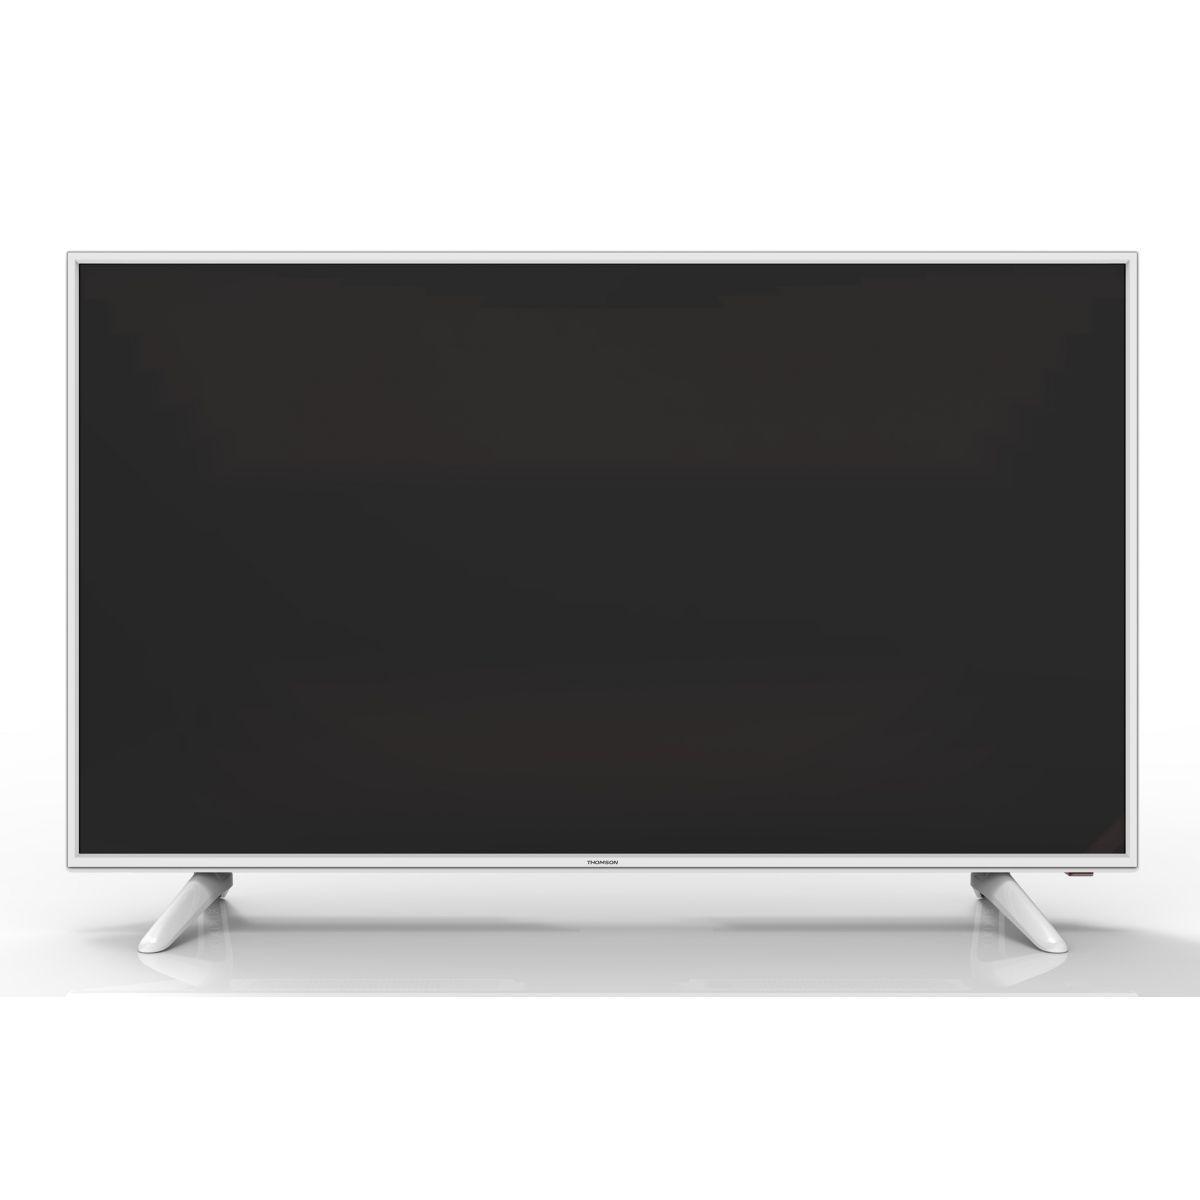 Tv thomson 32hc3101w